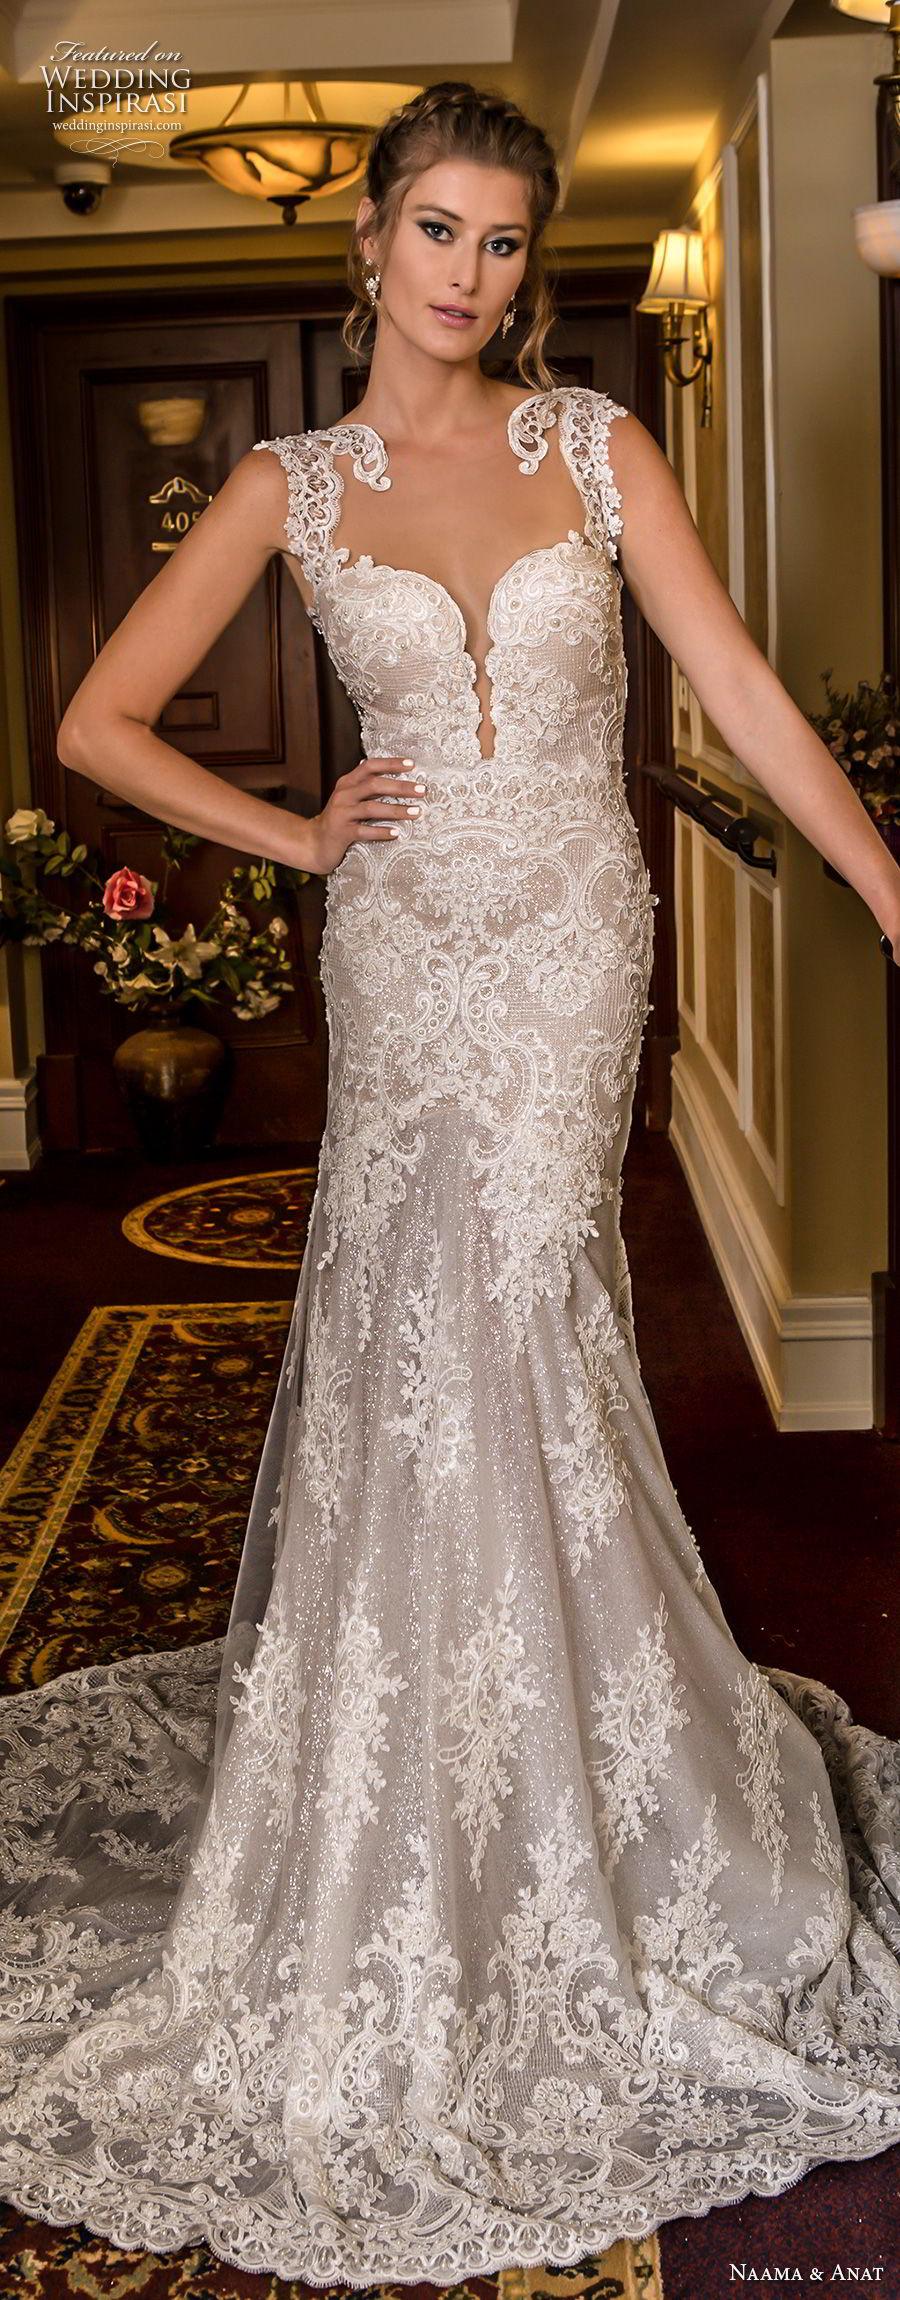 naama and anat fall 2018 bridal cap sleeves deep plunging sweetheart neckline full embellishment elegant trumpet wedding dress low open back medium train (2) mv